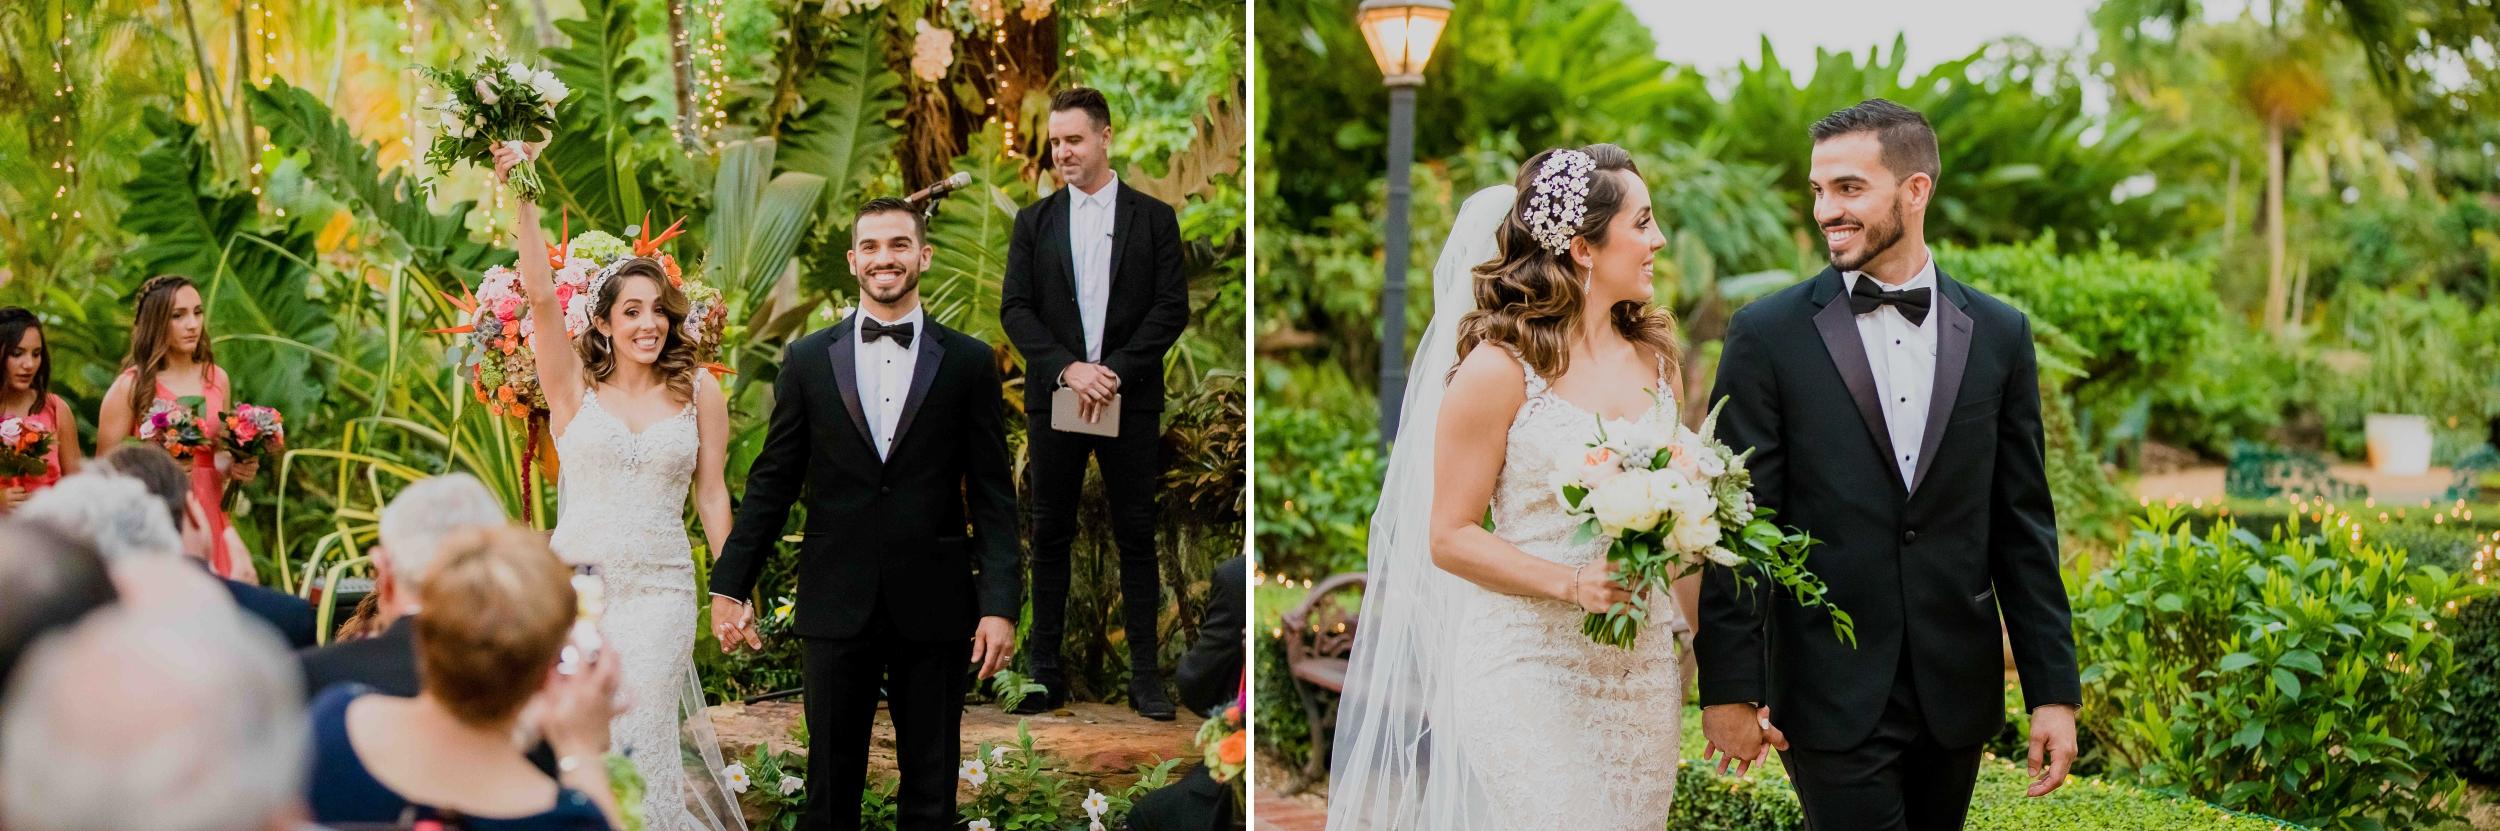 Wedding Miller Plantation Photography by Santy Martinez 12.jpg